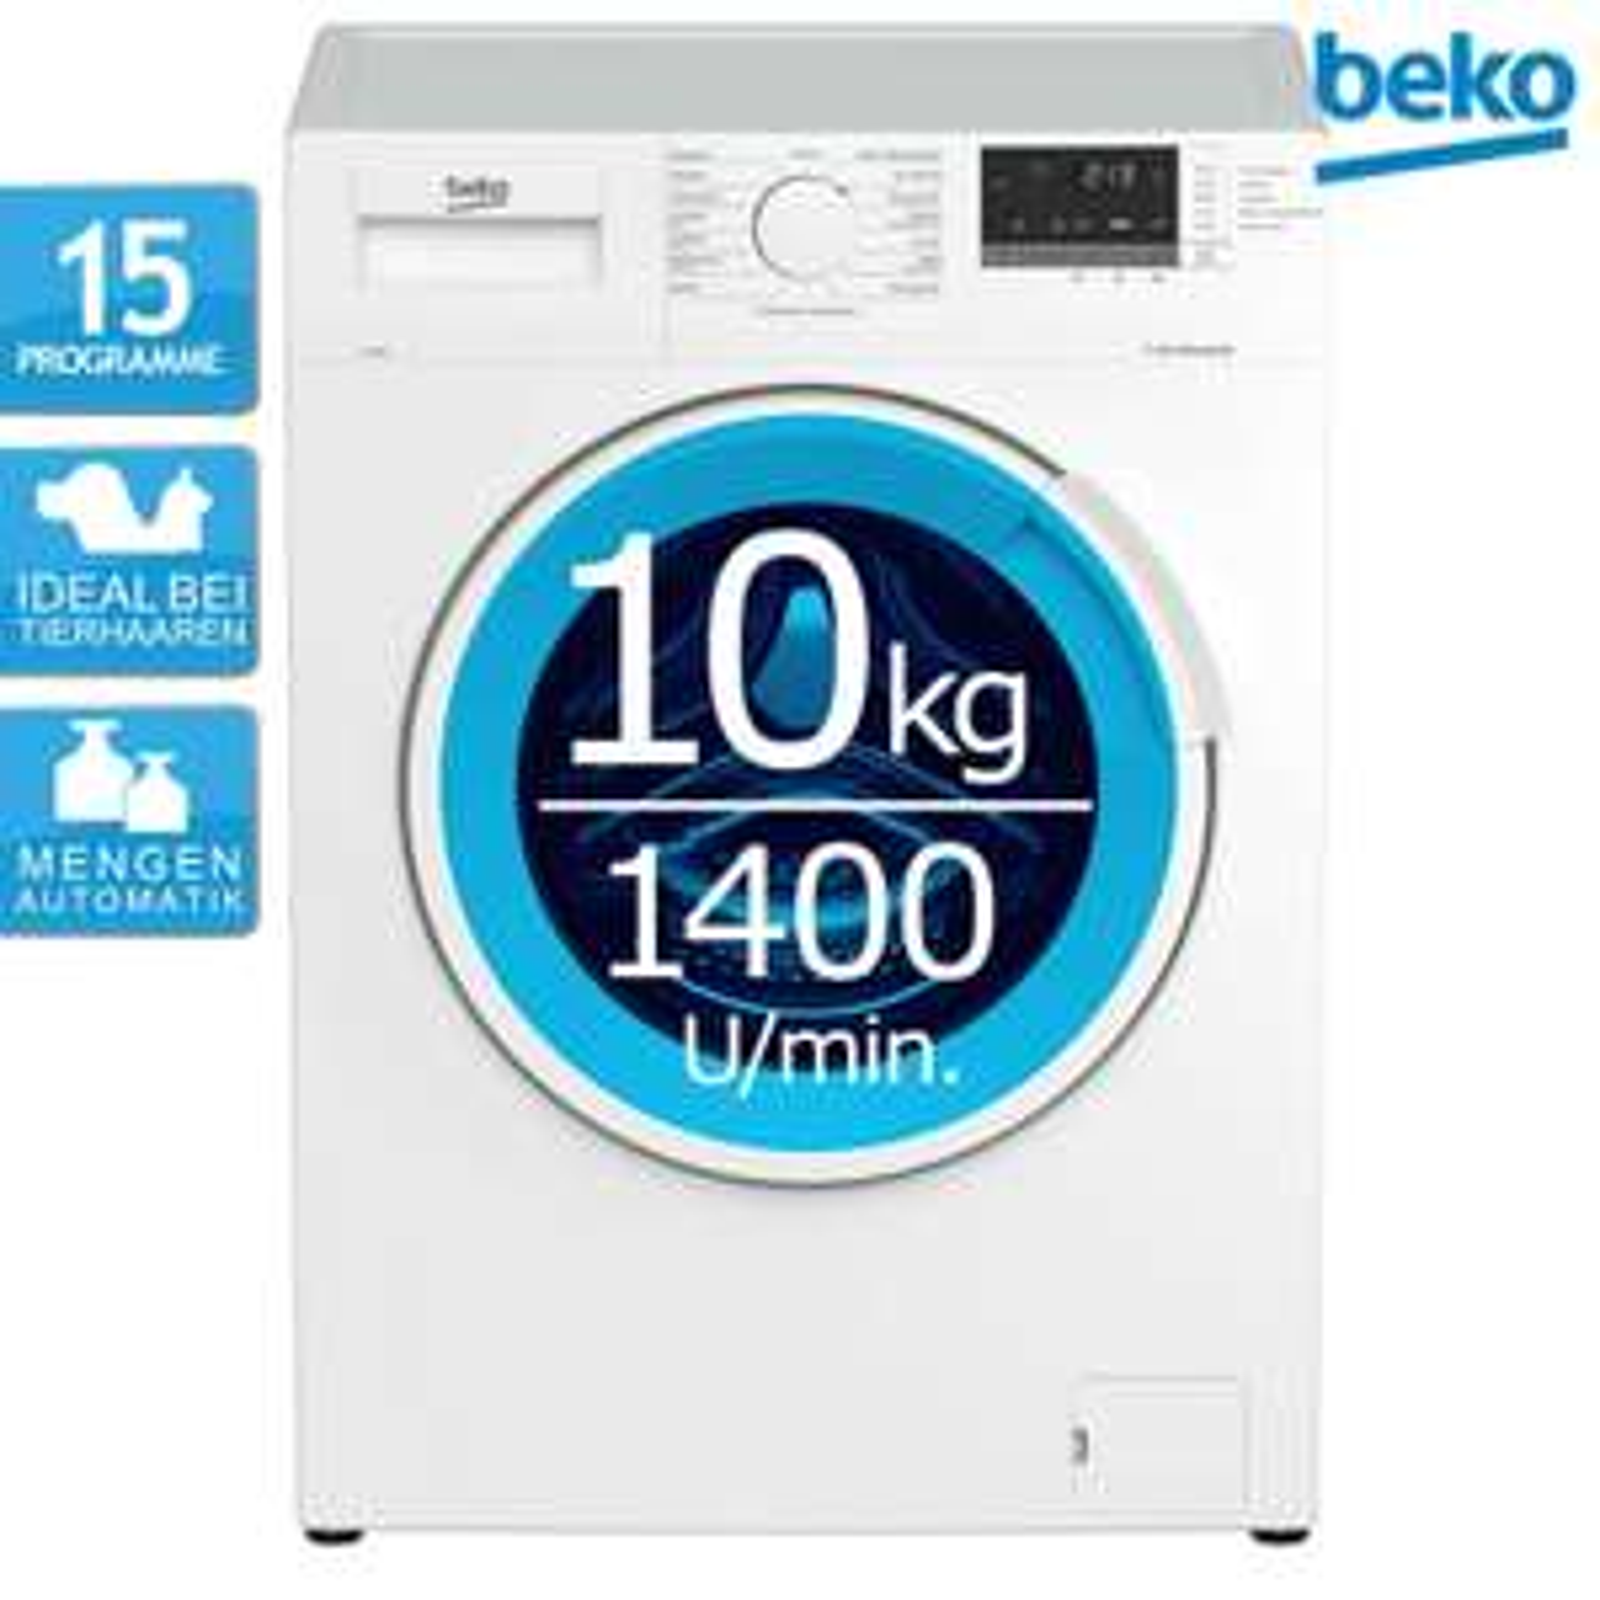 BEKO WMB101434LP1 10kg Waschmaschine (1400Upm, EEK B bzw. A+++ alt, AddXtra Nachlegefunktion, Mengenautomatik, 15 Programme)